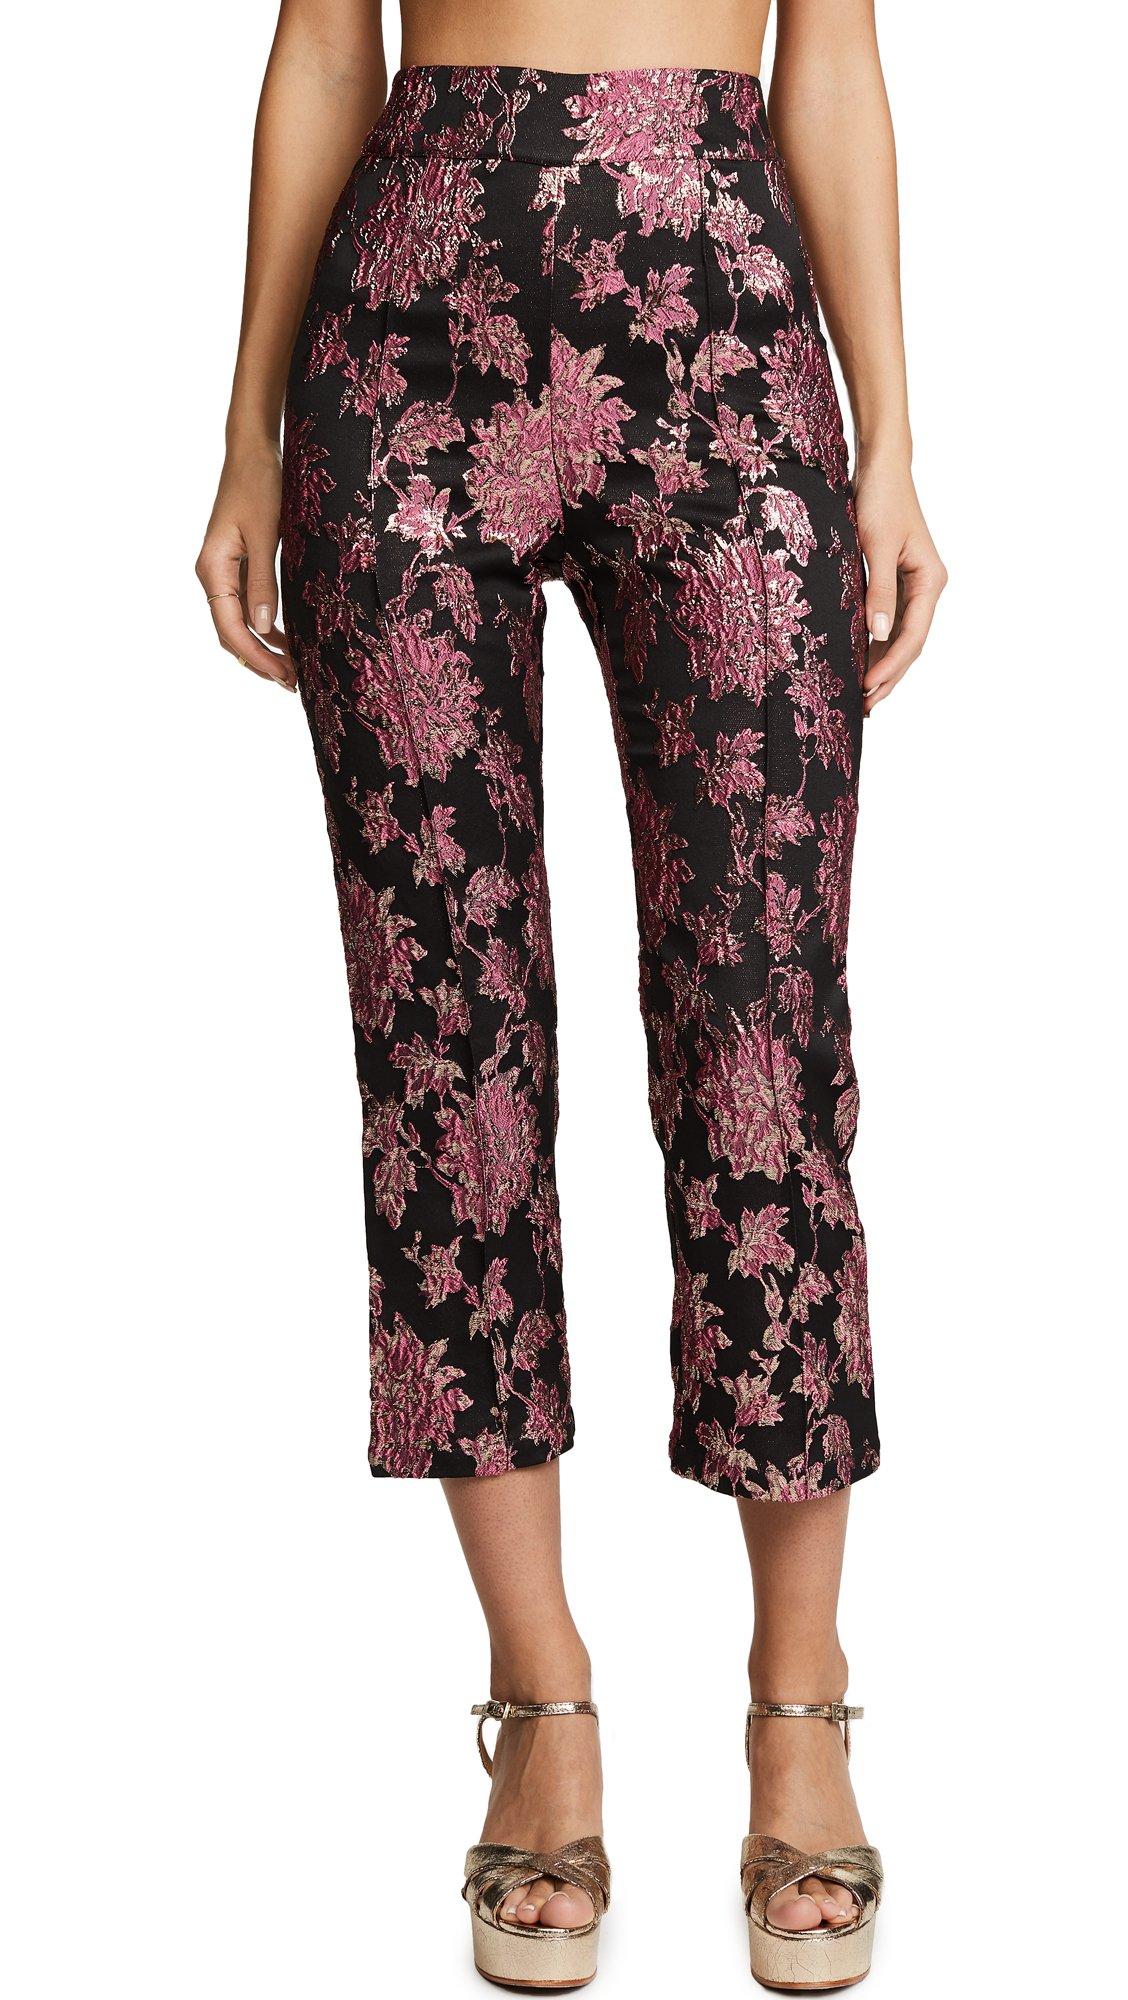 For Love & Lemons Women's Luella Cigarette Pants, Metallic, Small